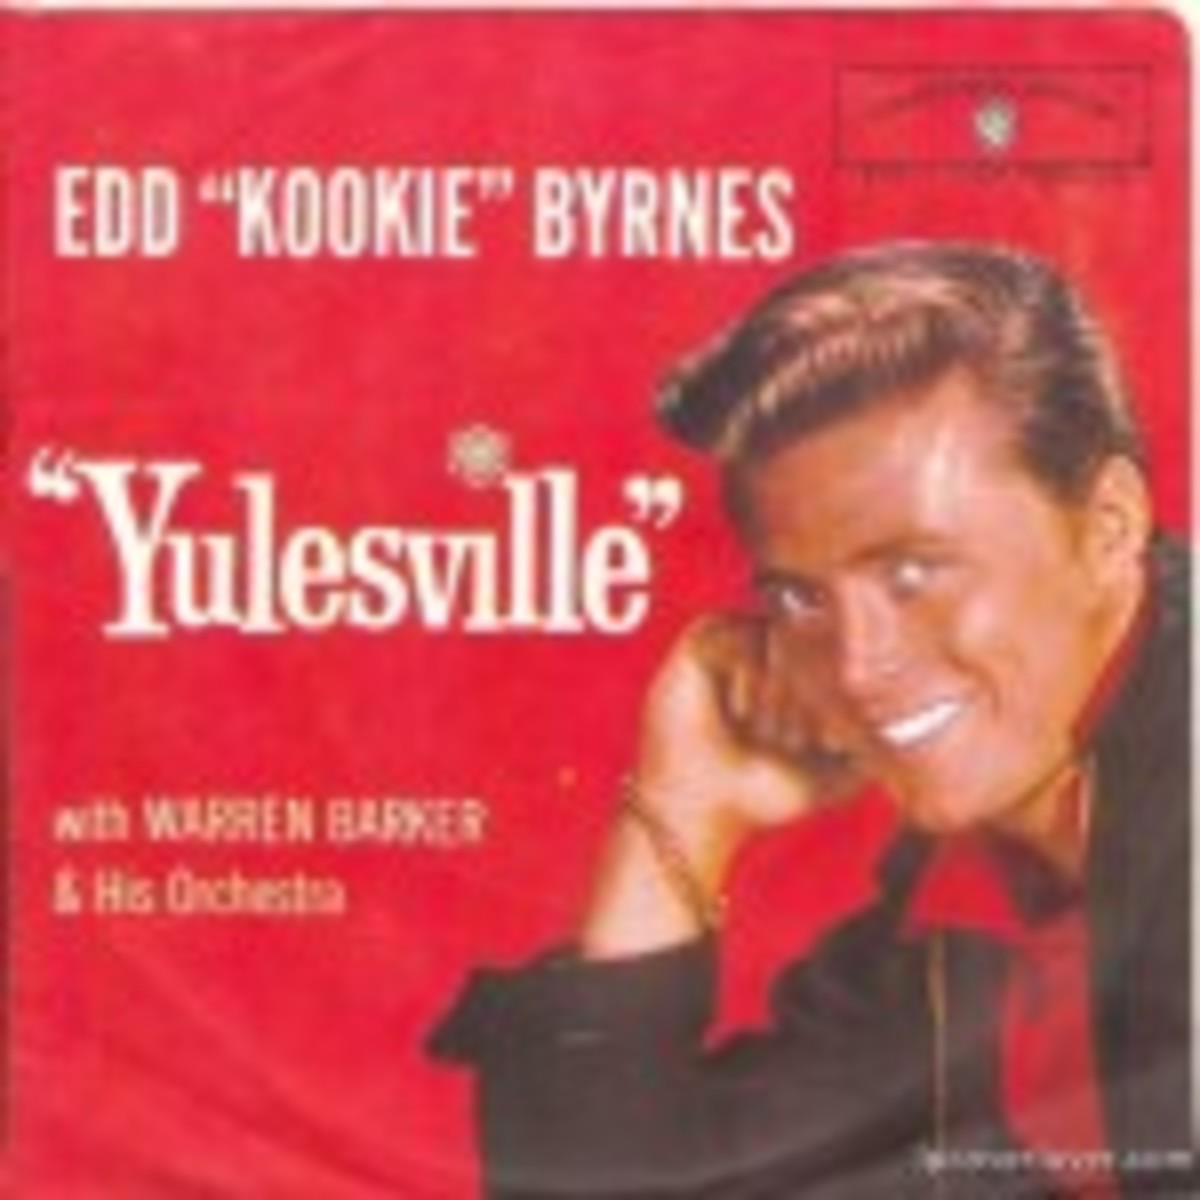 Edd Kookie Byrnes Yulesville